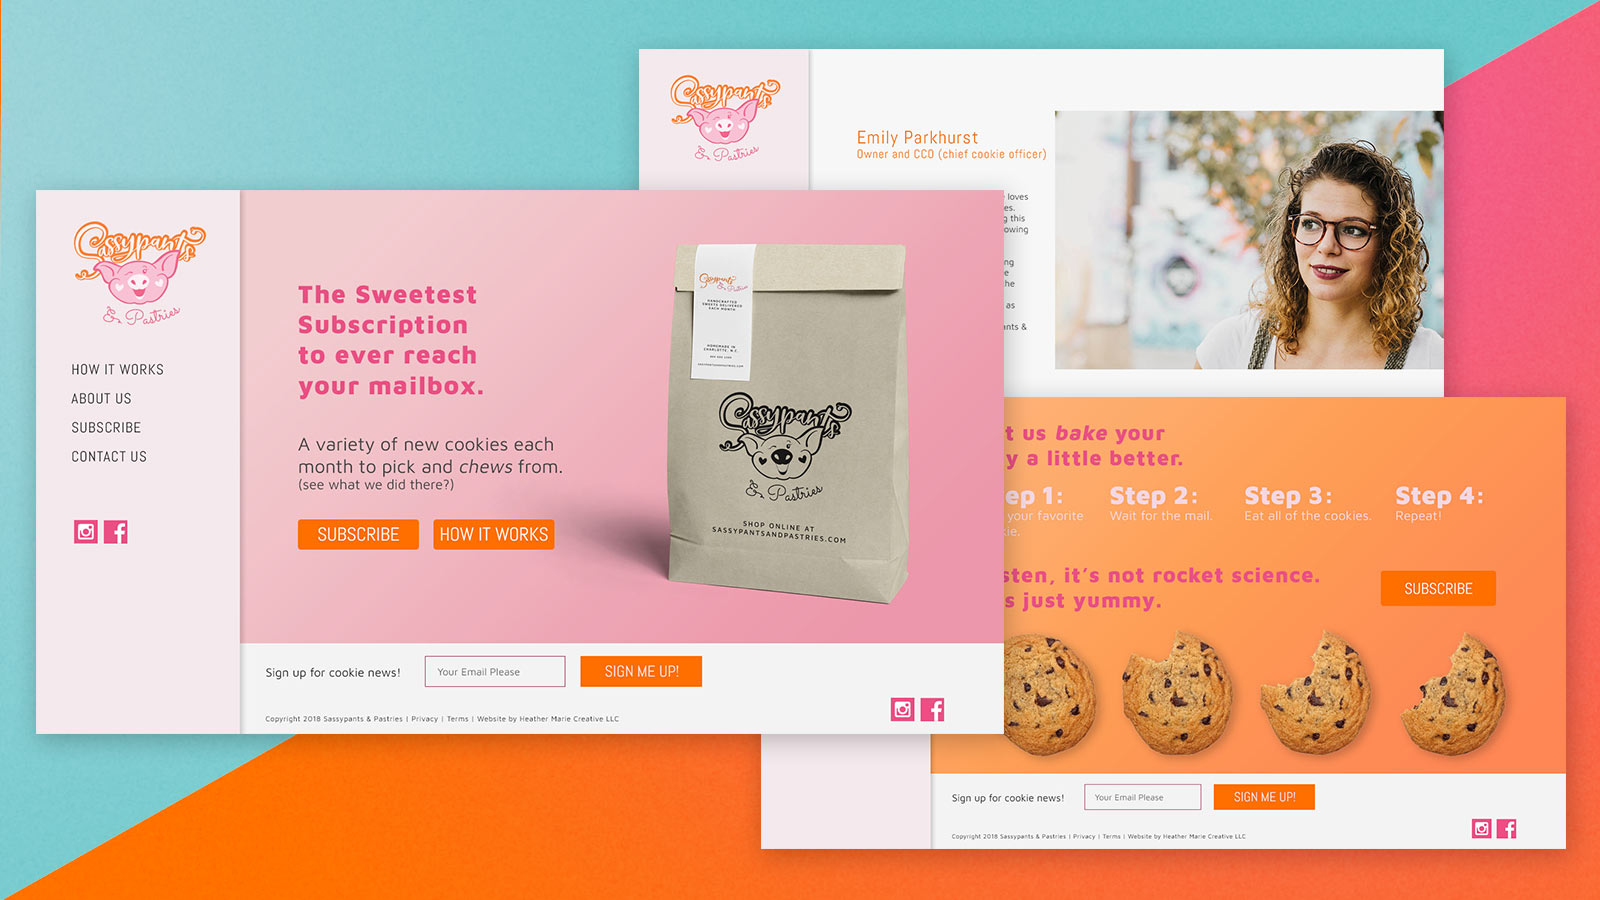 SassyPants & Pastries Subscription web design collage